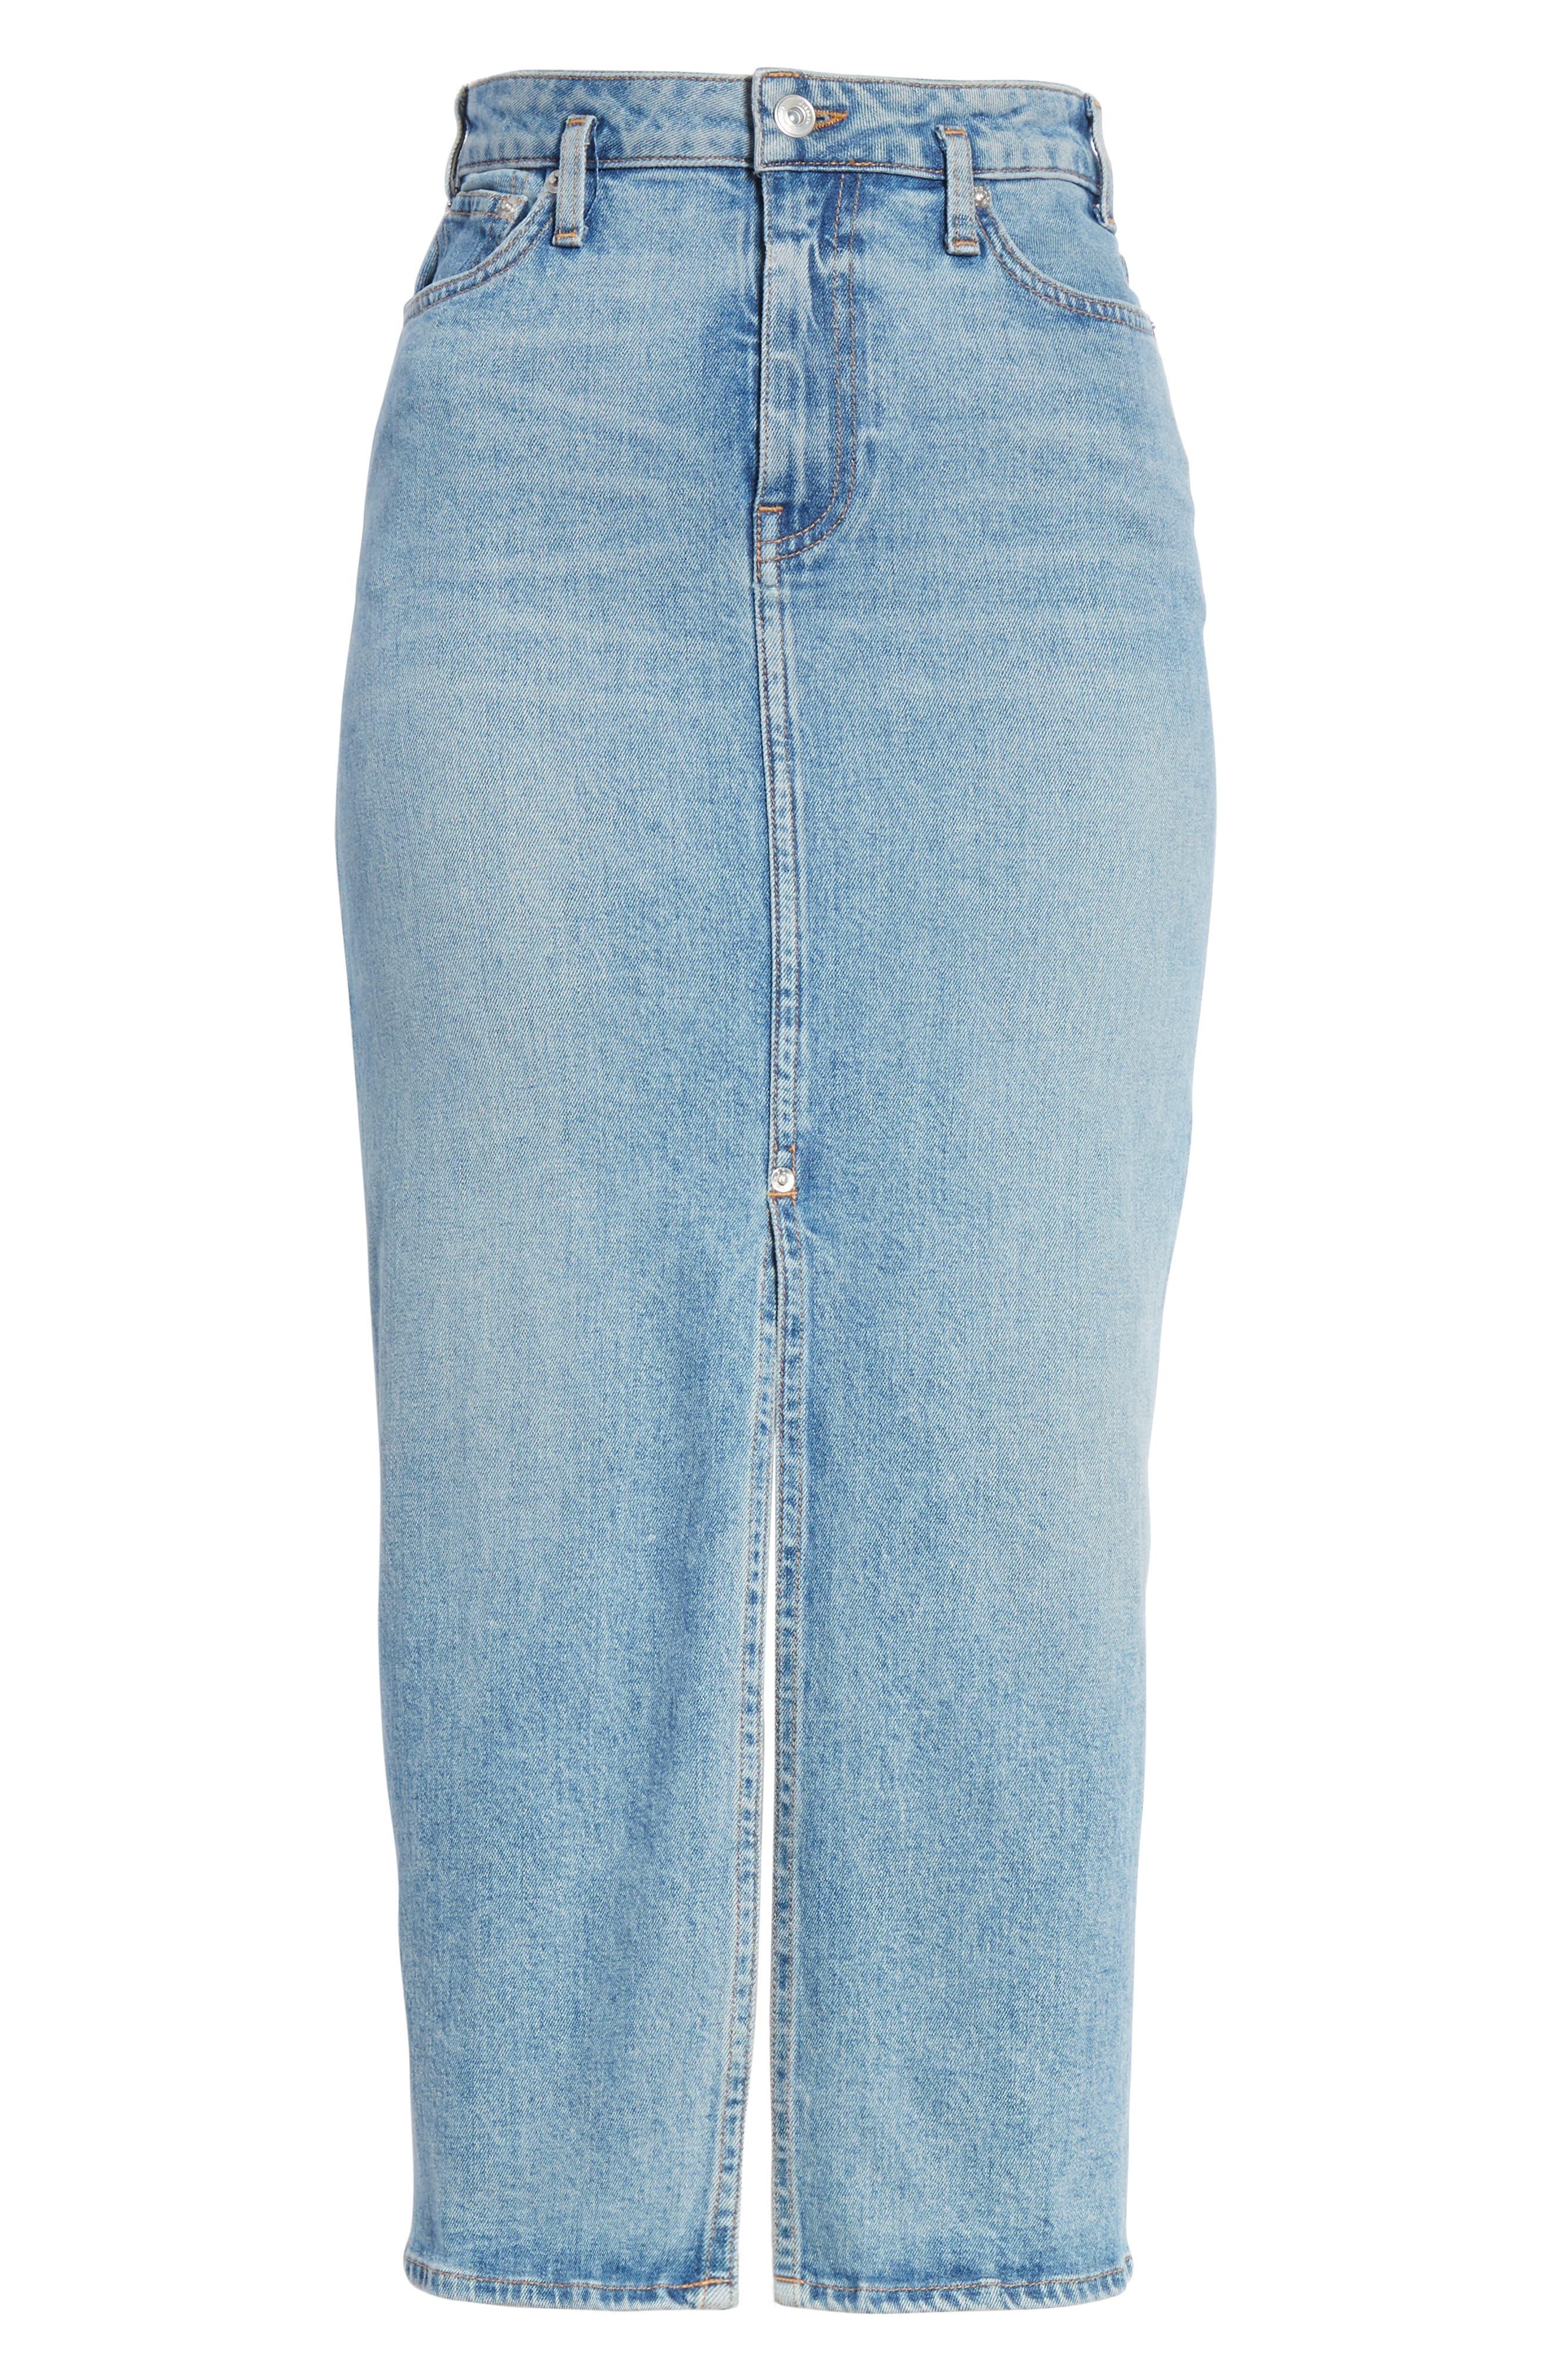 PROENZA SCHOULER, Slit Seam Denim Midi Skirt, Alternate thumbnail 6, color, CALIFORNIA